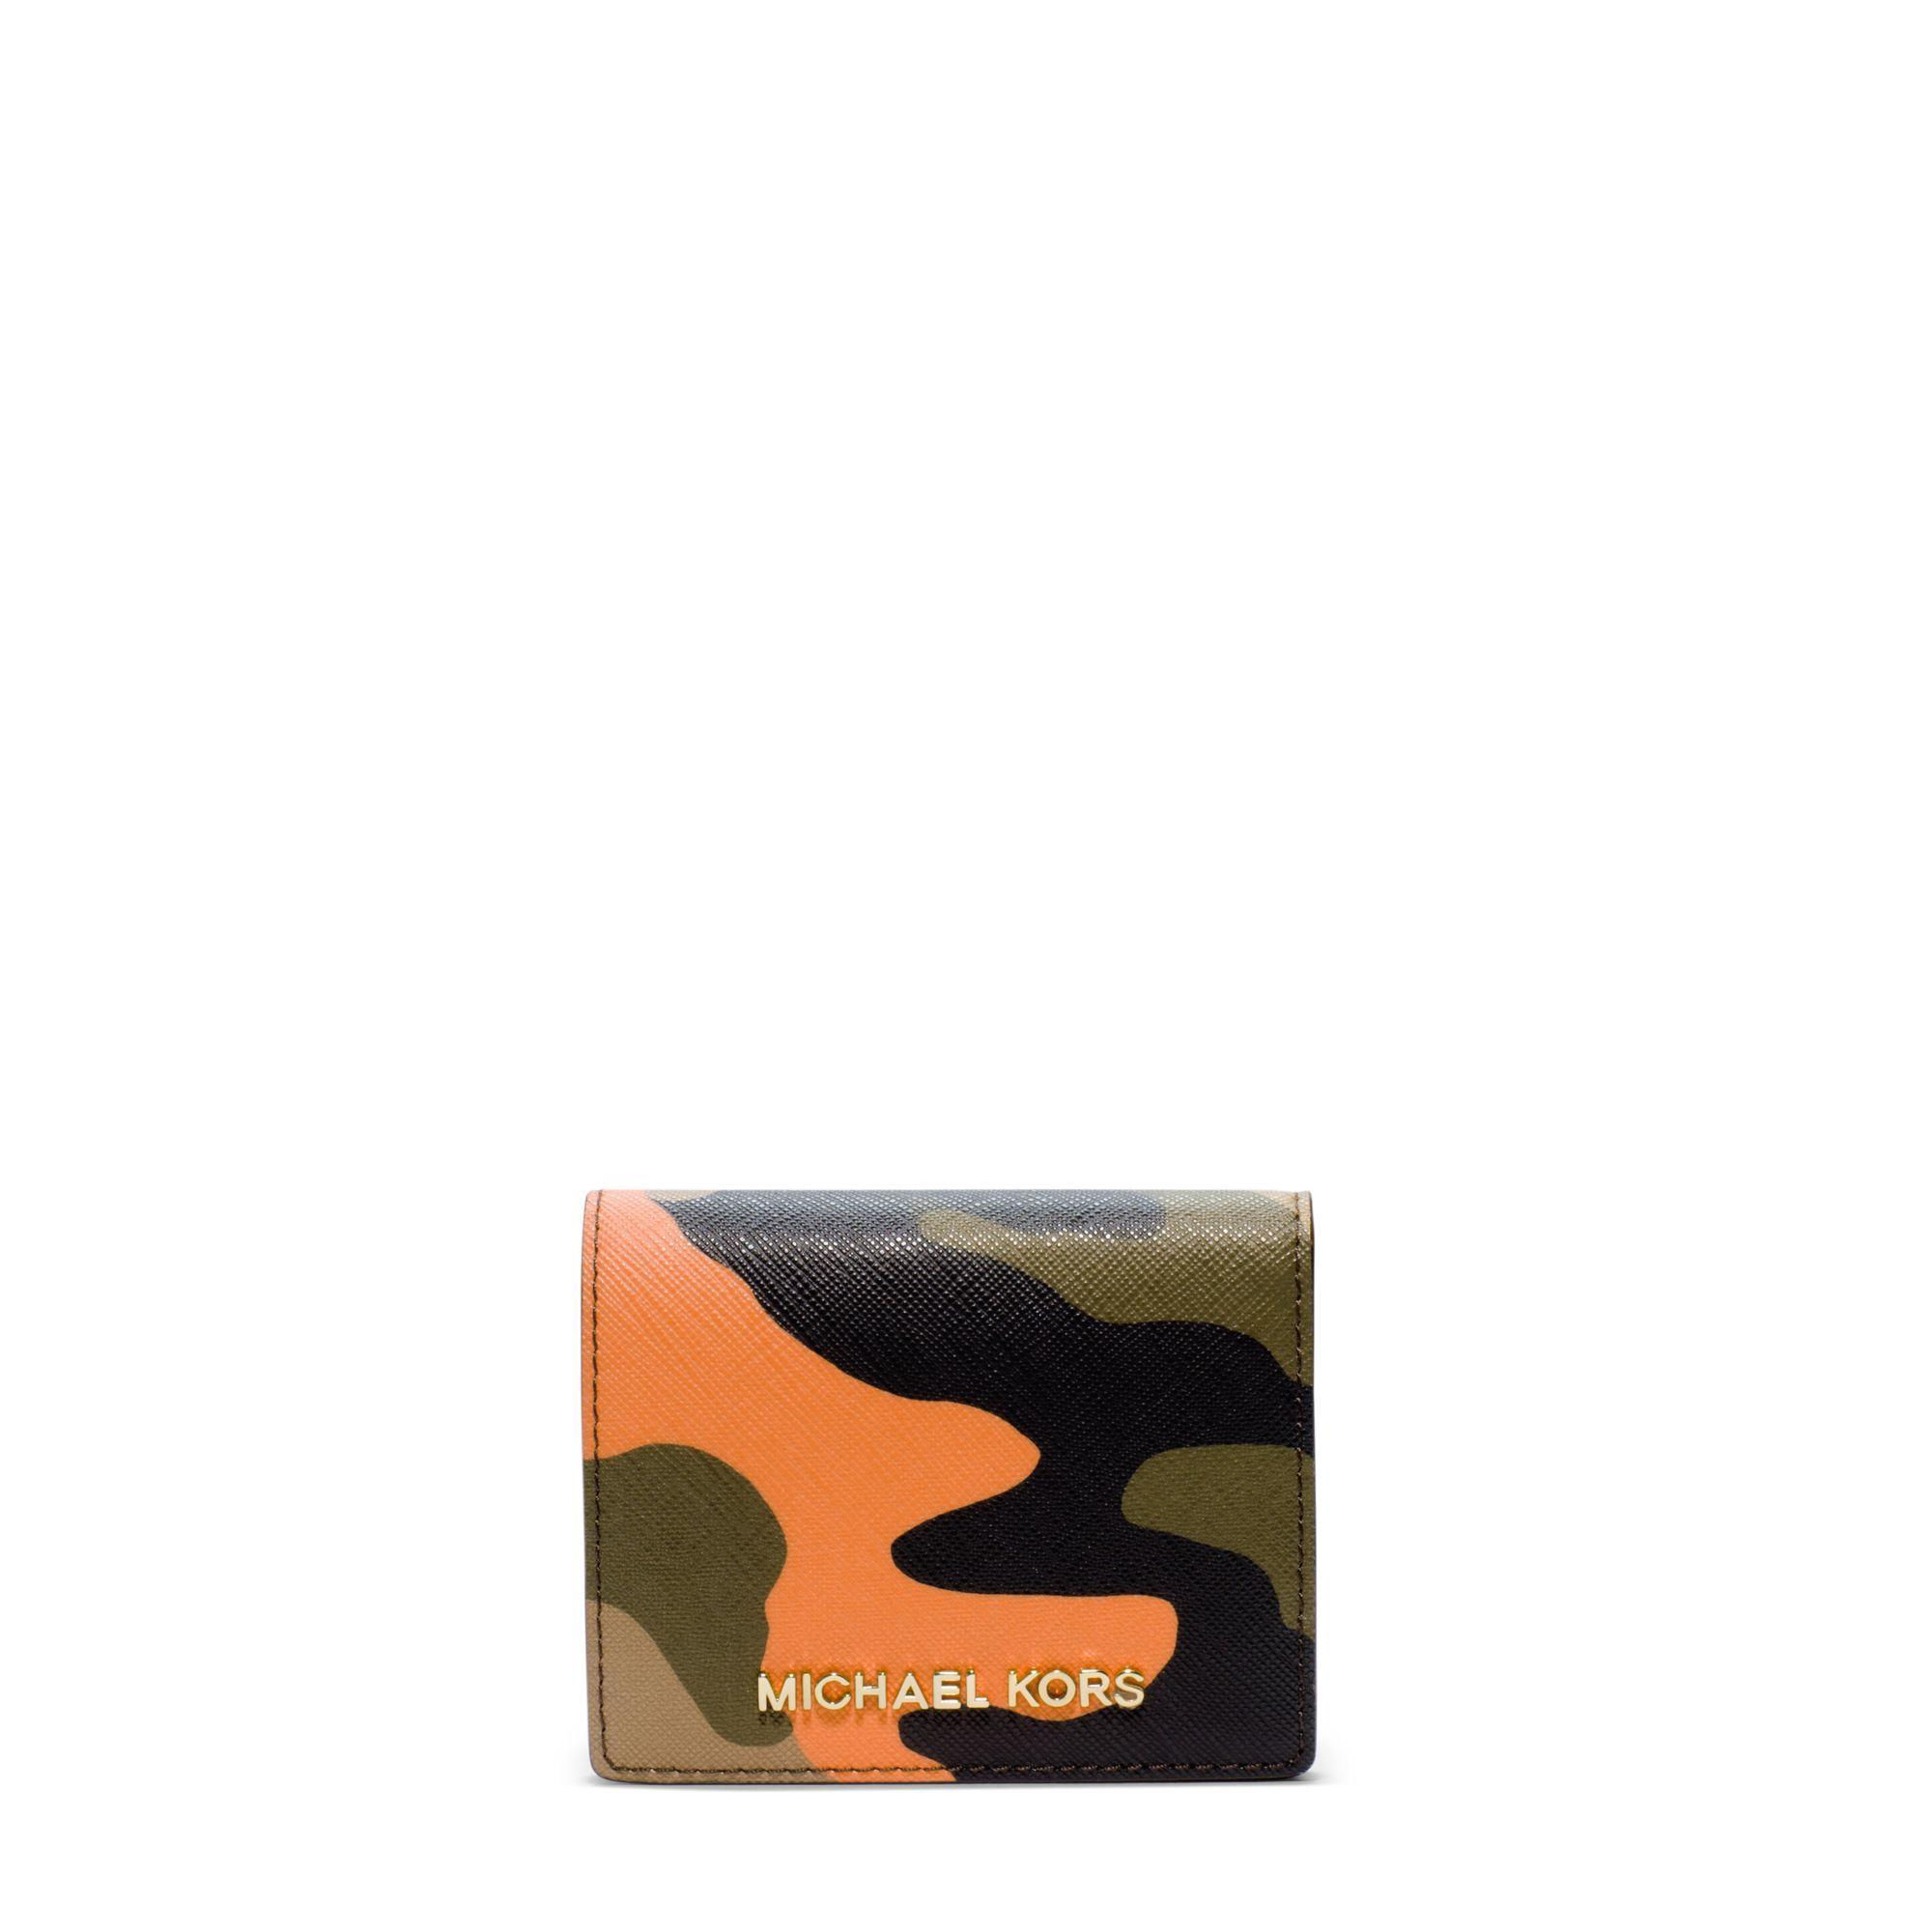 Michael Kors Jet Set Camouflage